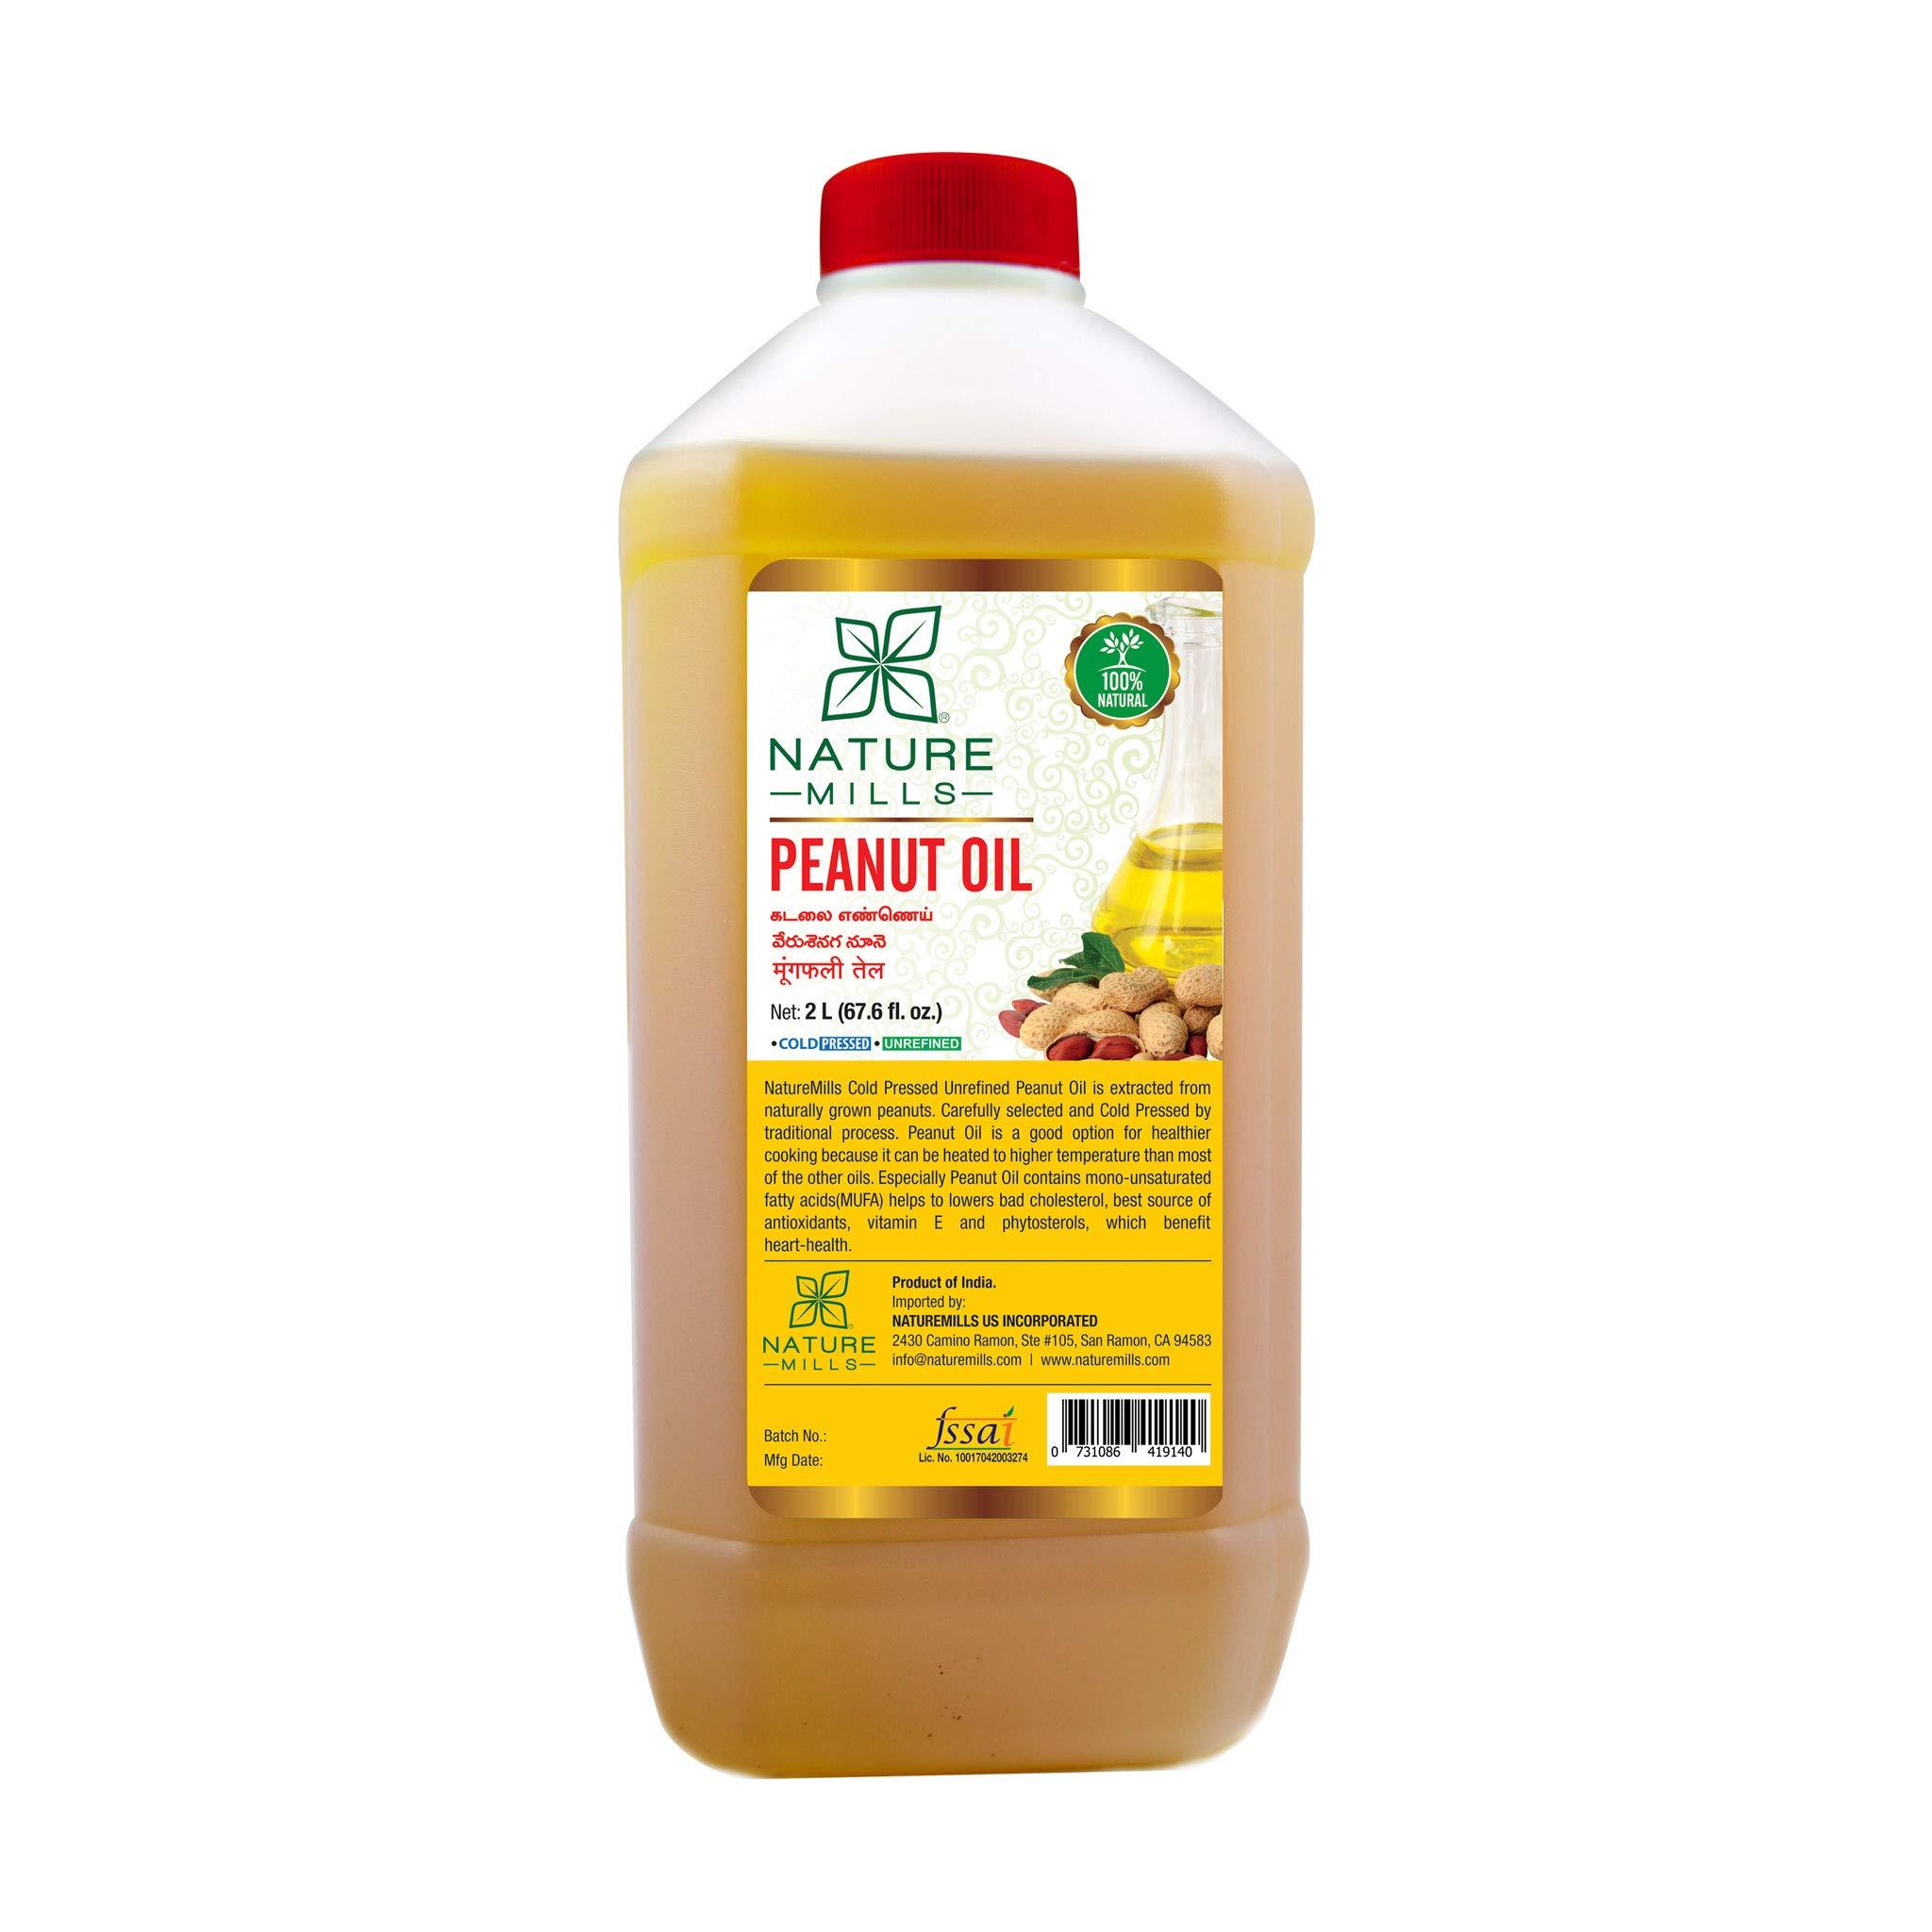 Natural Peanut Oil - 2 Liter - 67.6 Fl.Oz by NatureMills